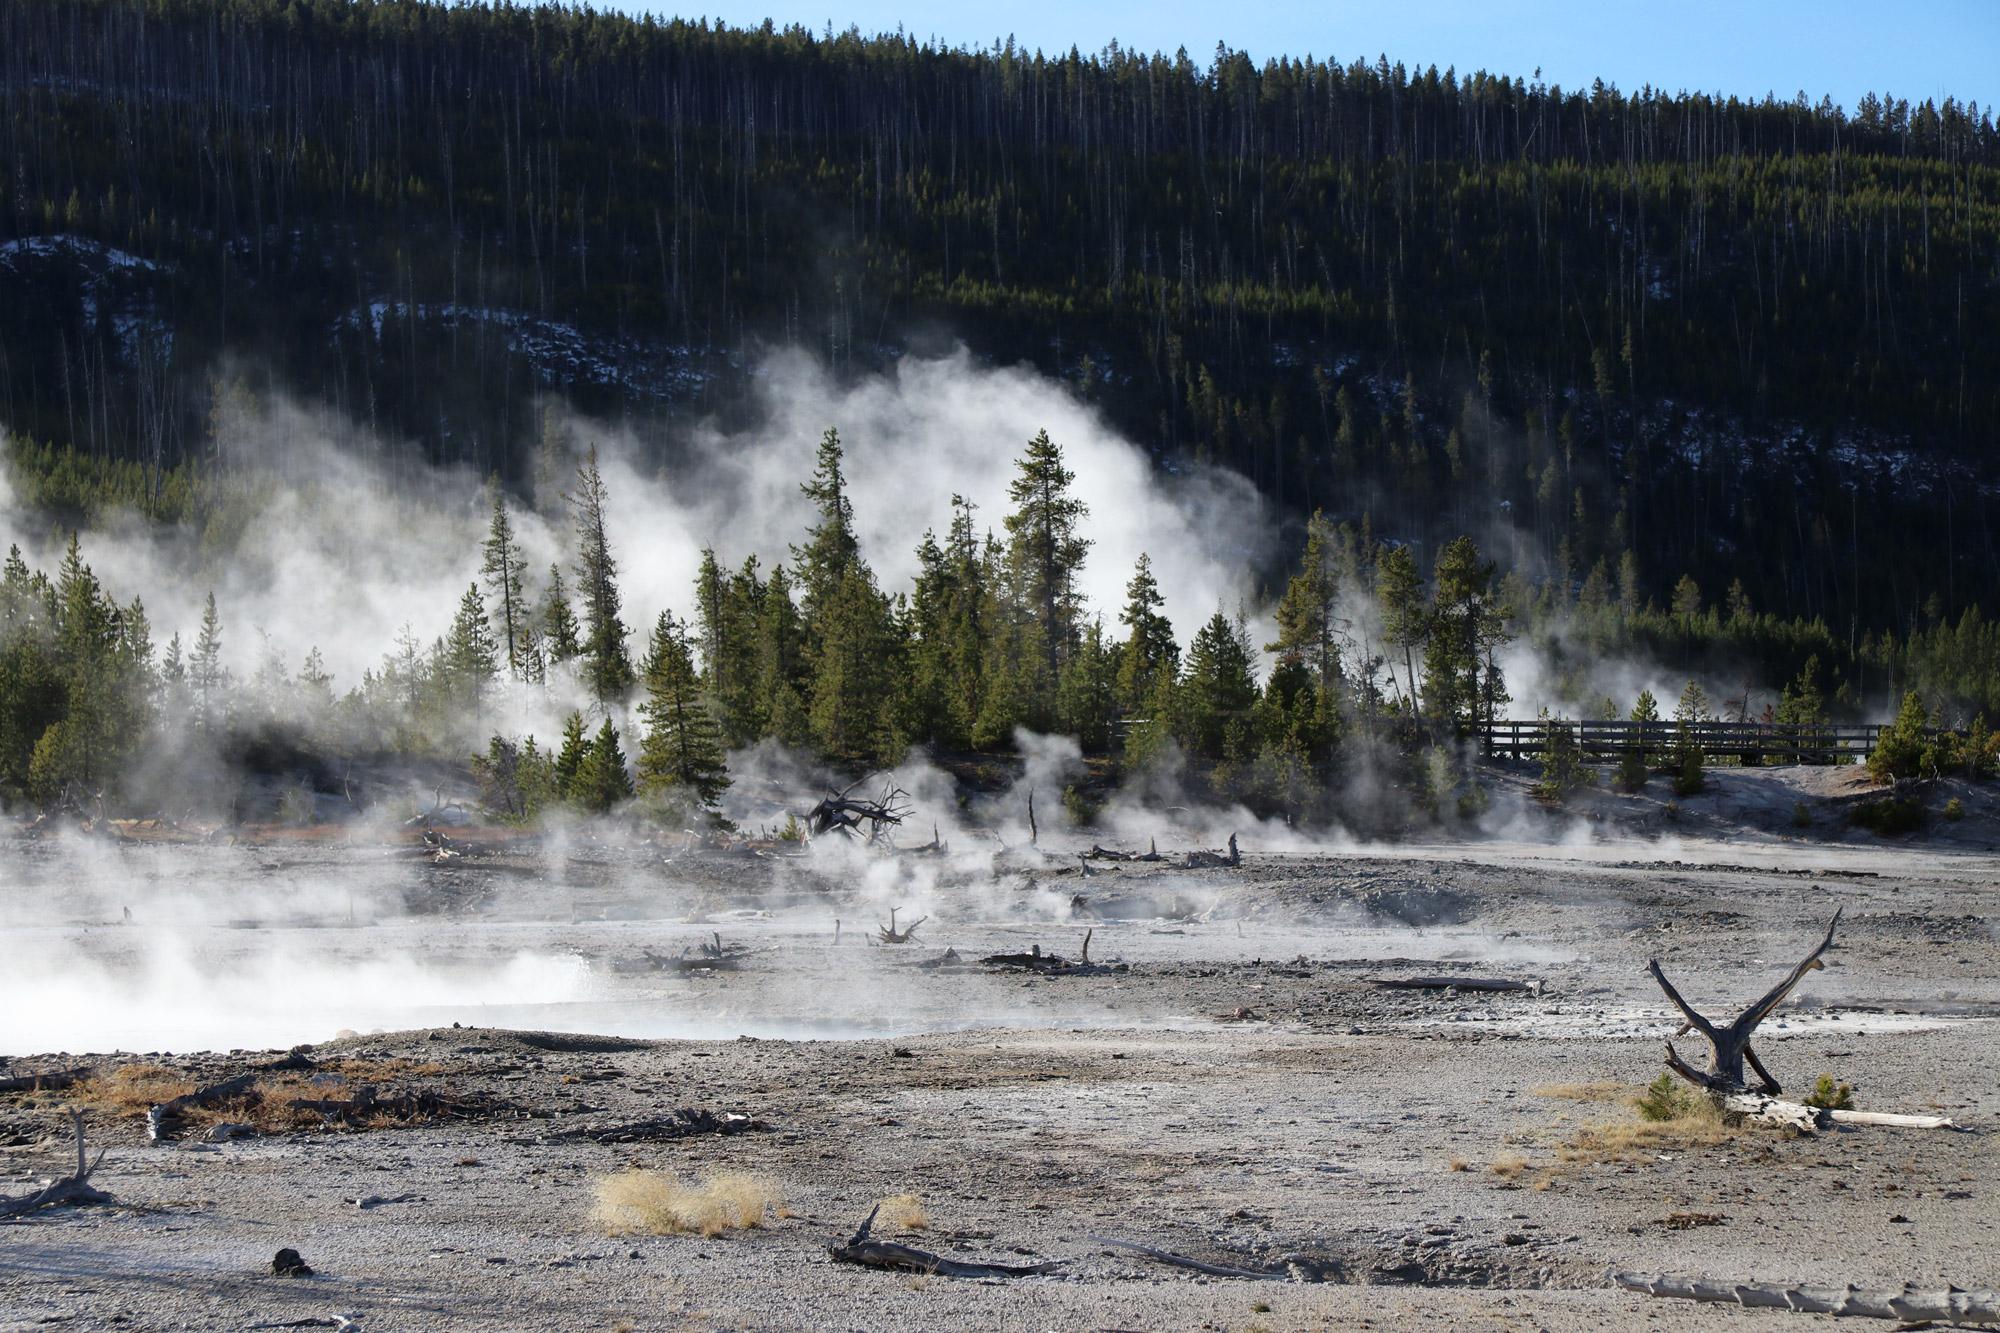 Amerika dag 5 - Yellowstone National Park - Norris Geyser Basin